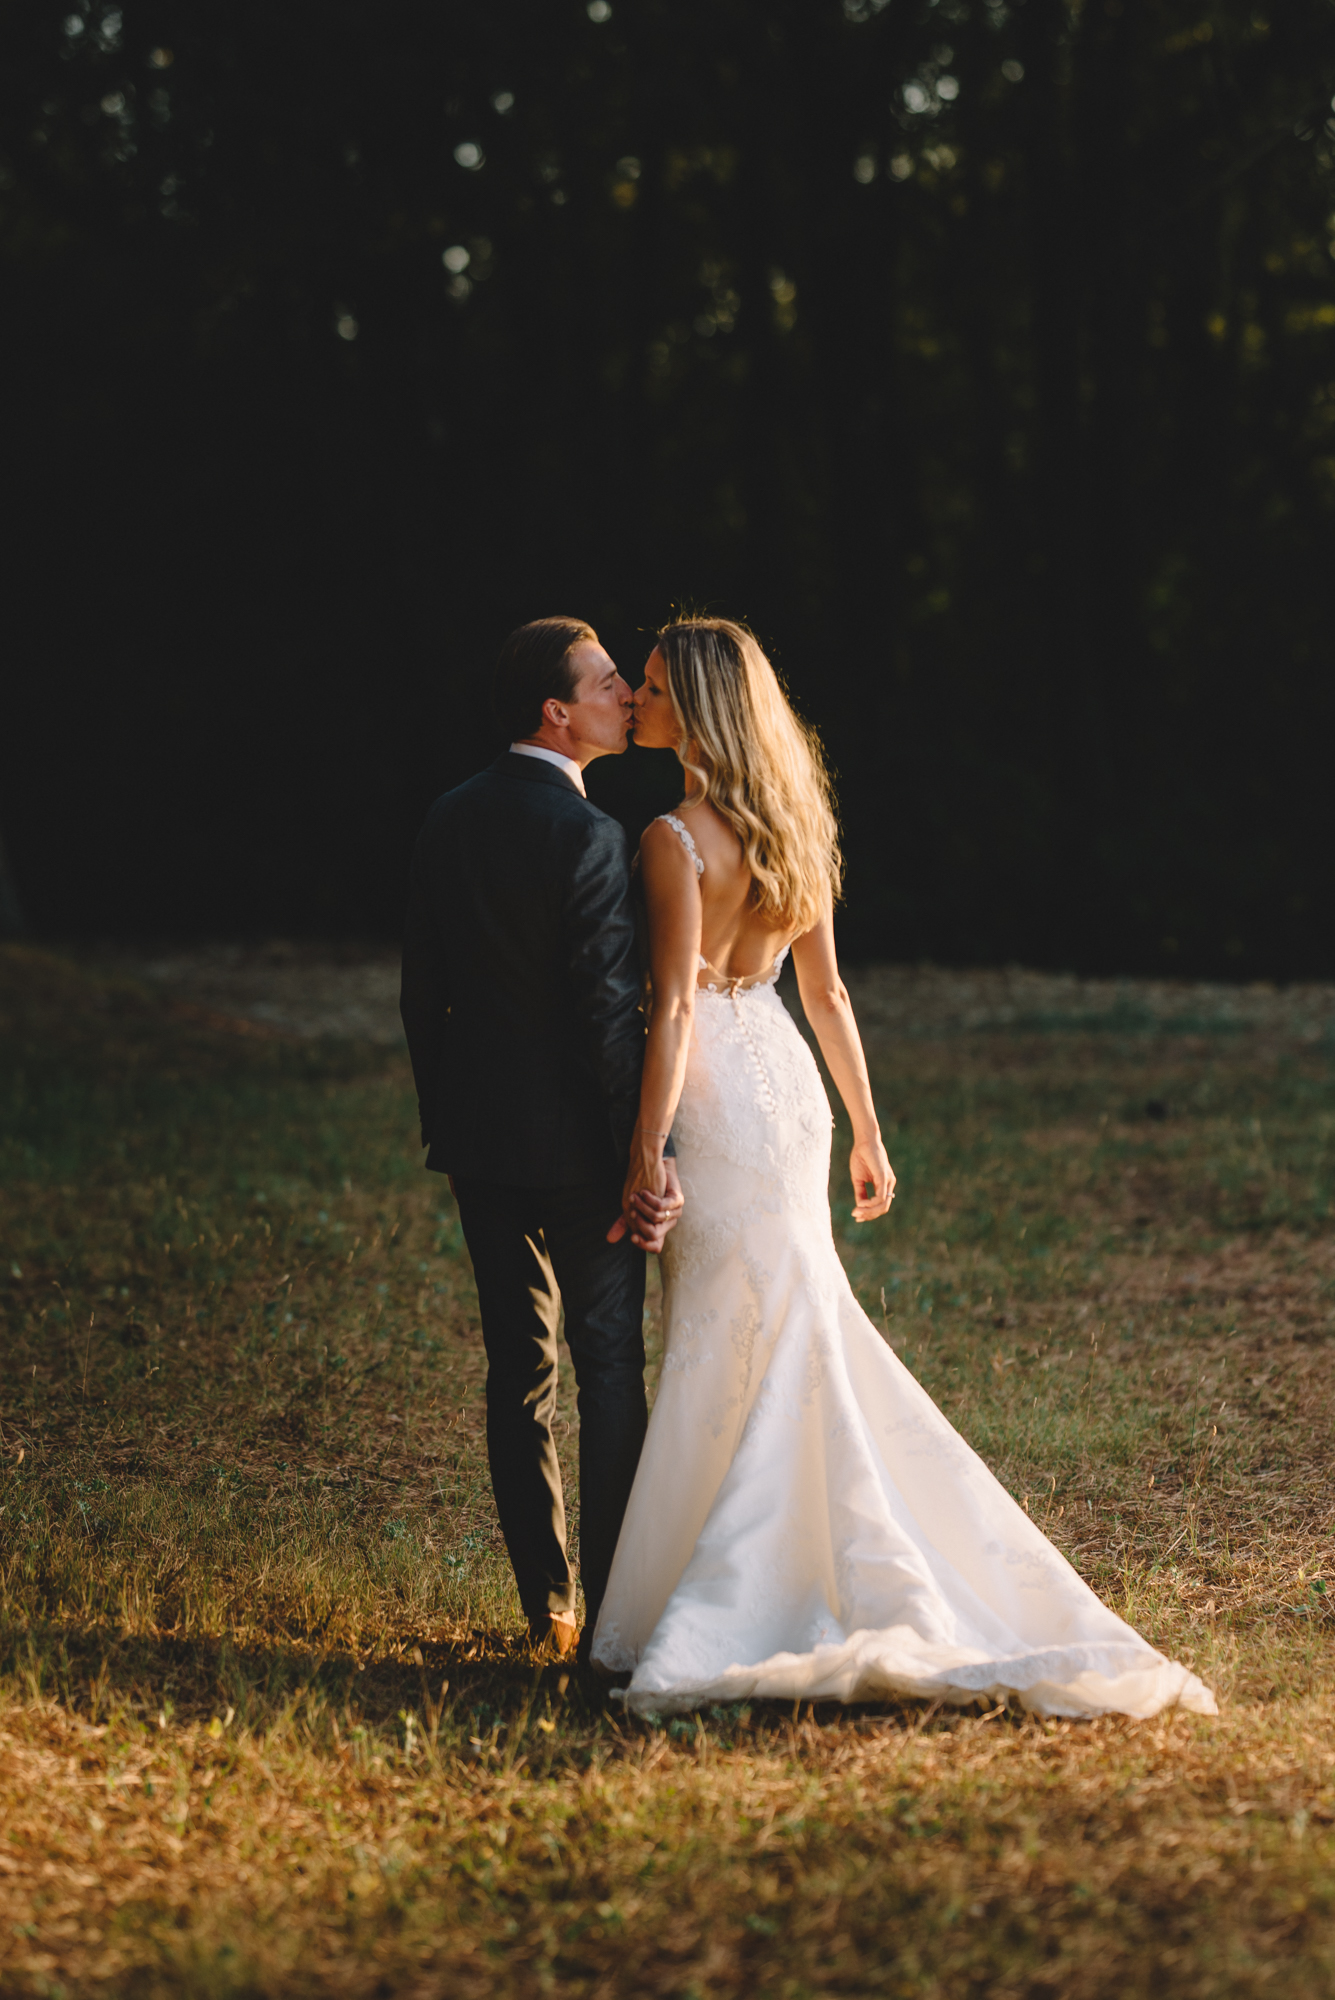 Wedding_Photographer_in_Tuscany_Italy-030.jpg